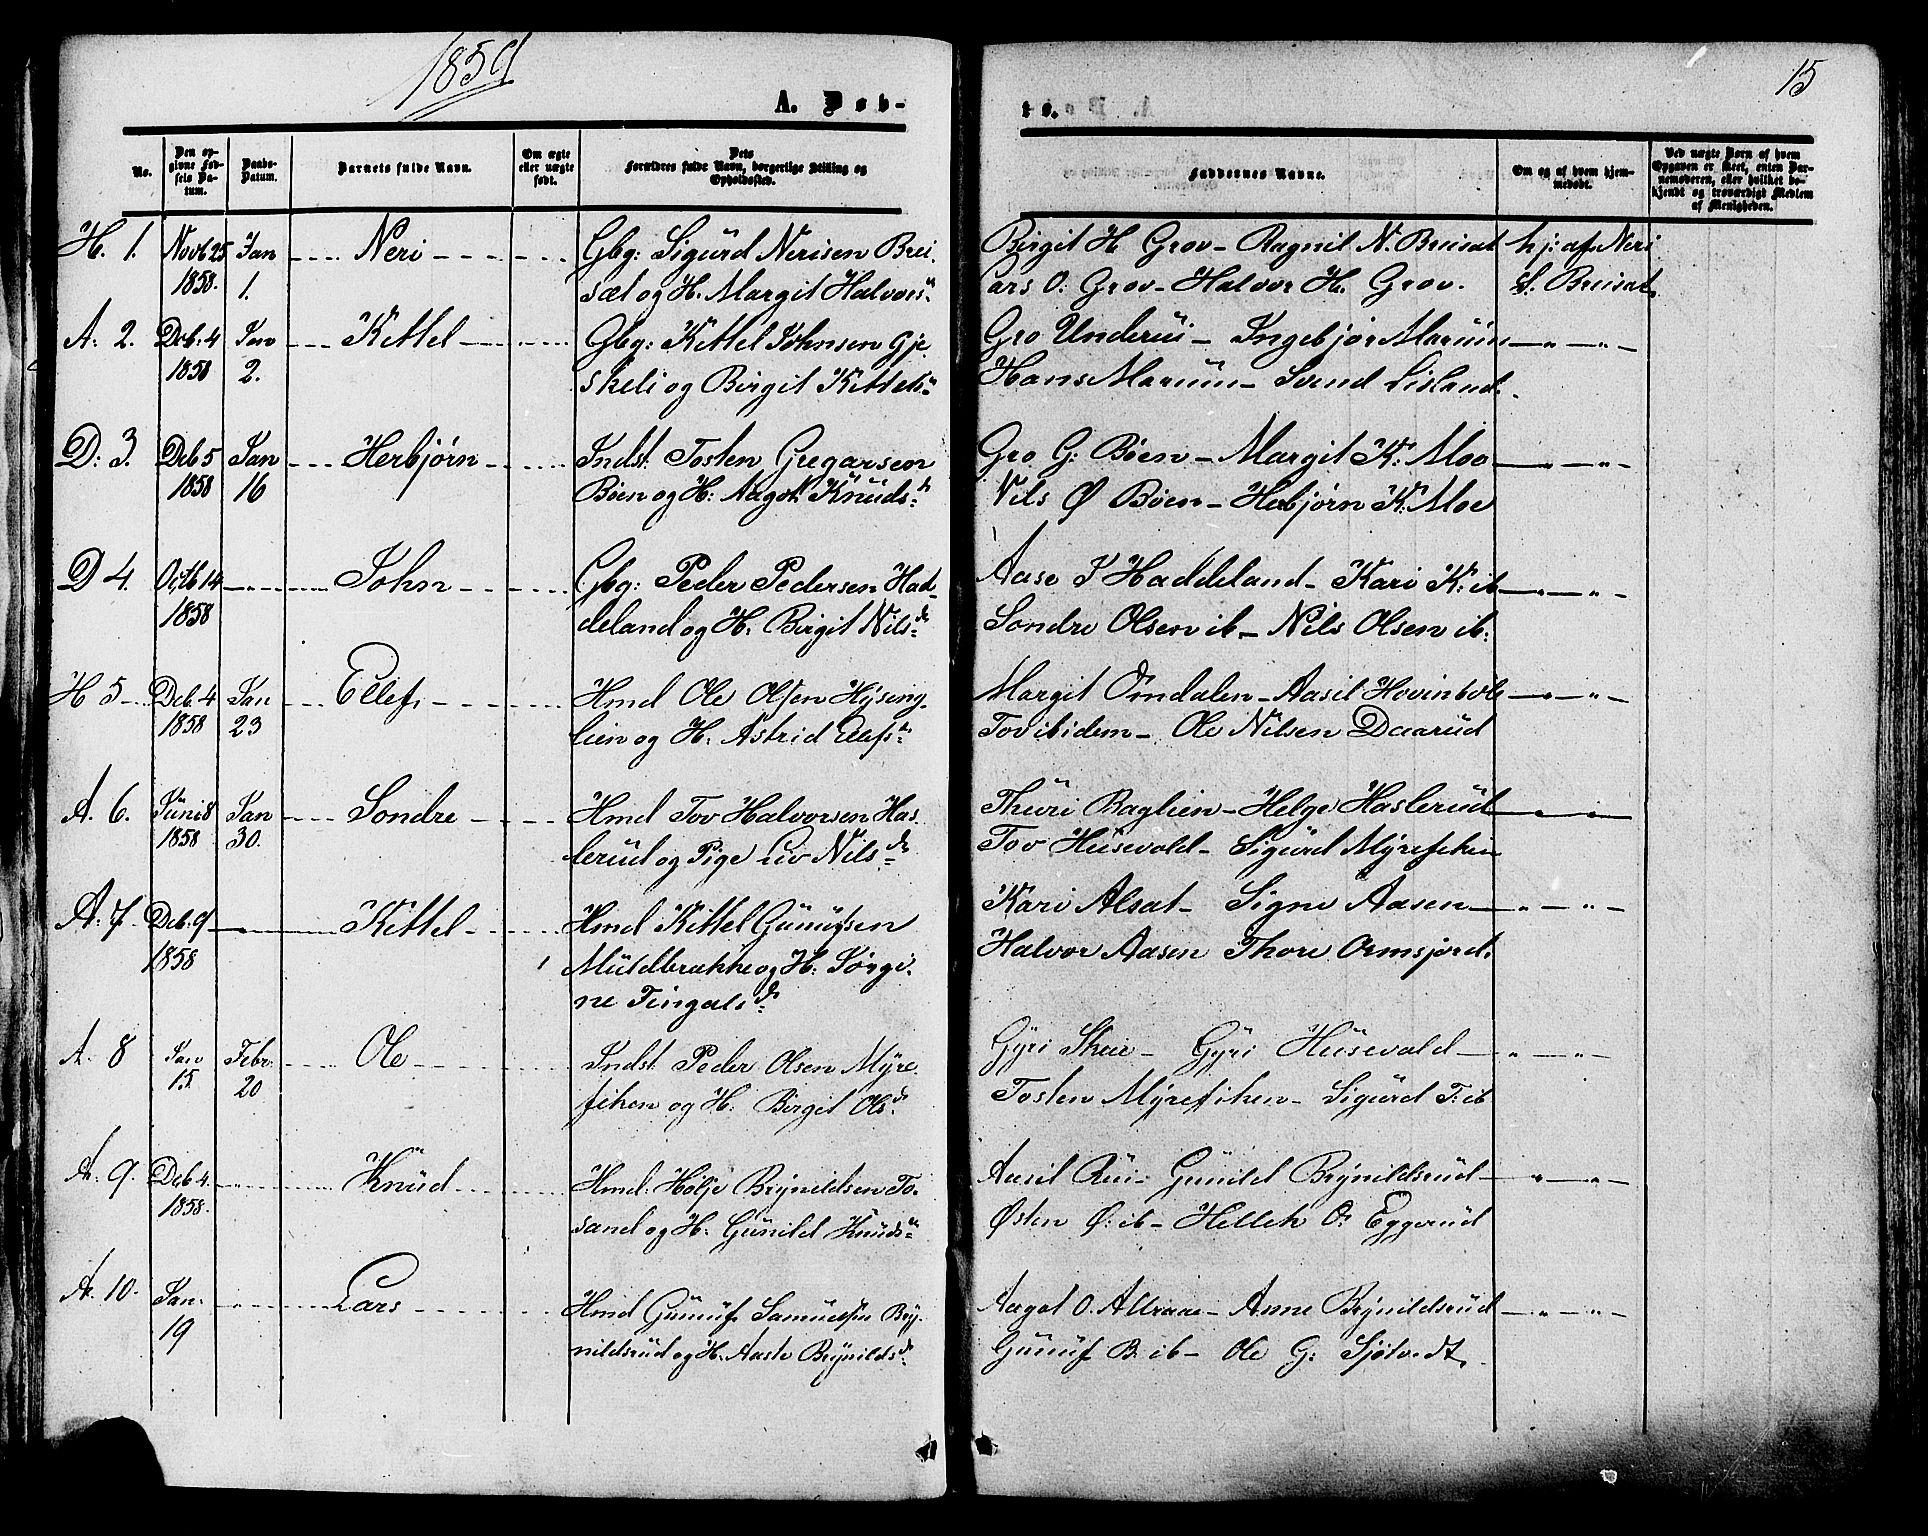 SAKO, Tinn kirkebøker, F/Fa/L0006: Ministerialbok nr. I 6, 1857-1878, s. 15